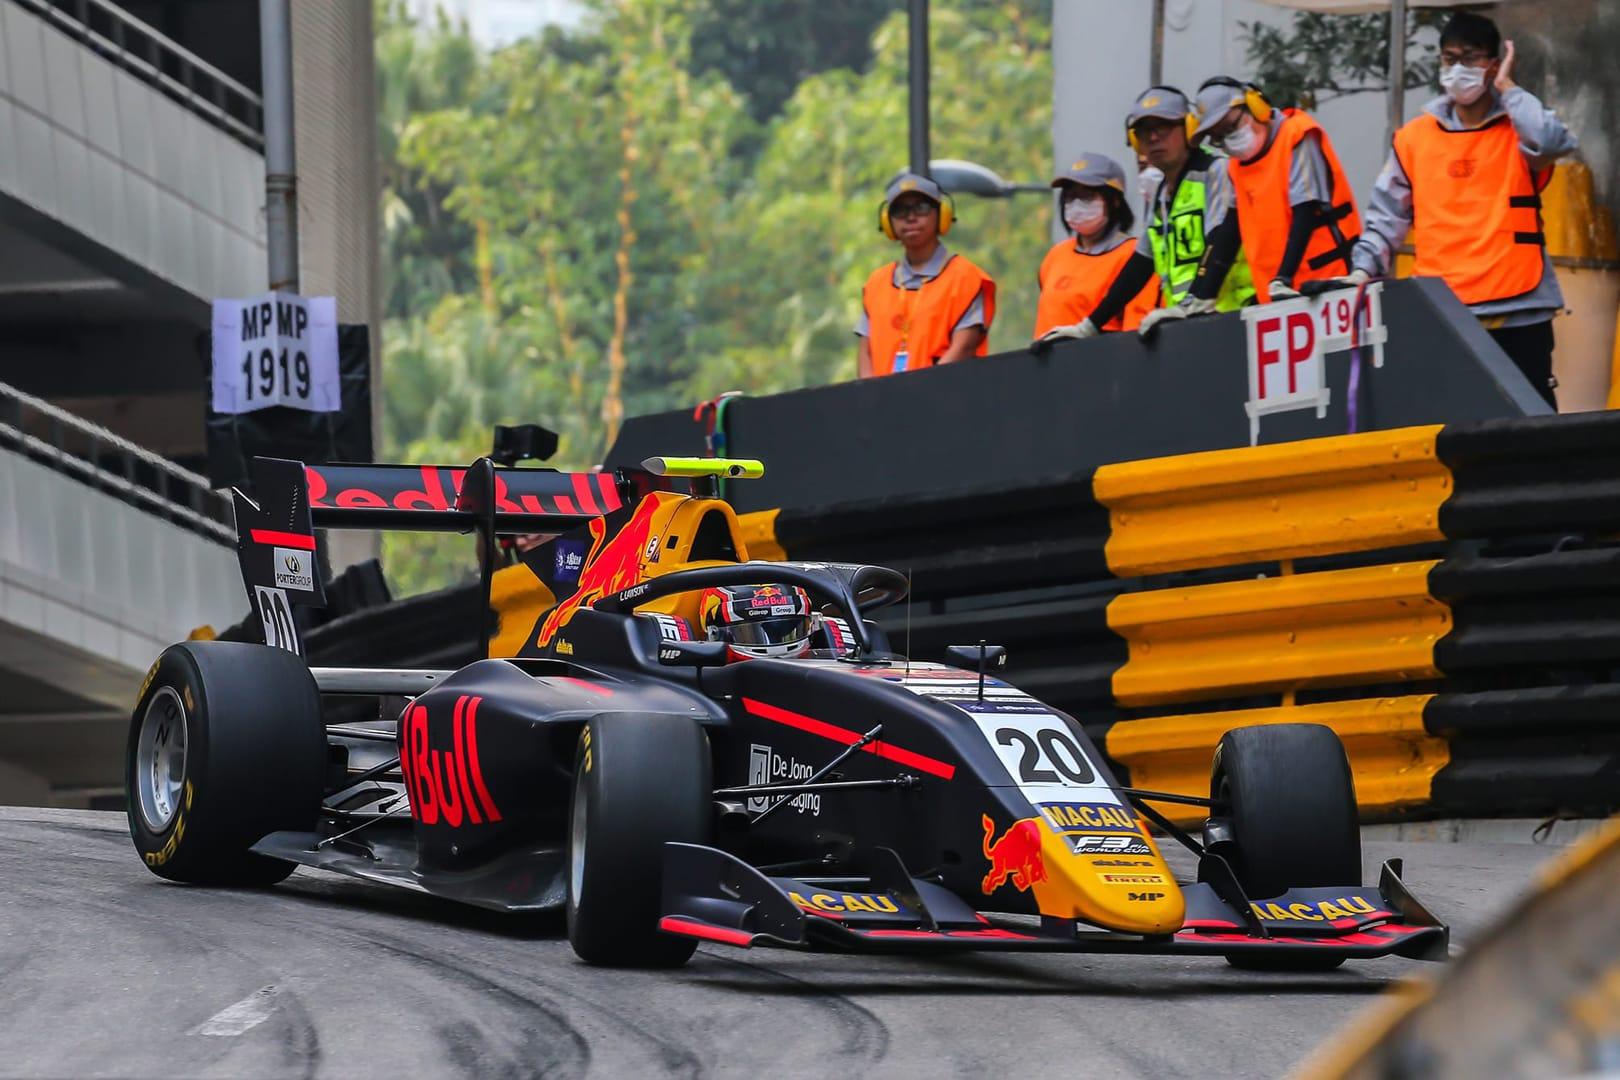 Lawsonstorms through the field at Macau GP